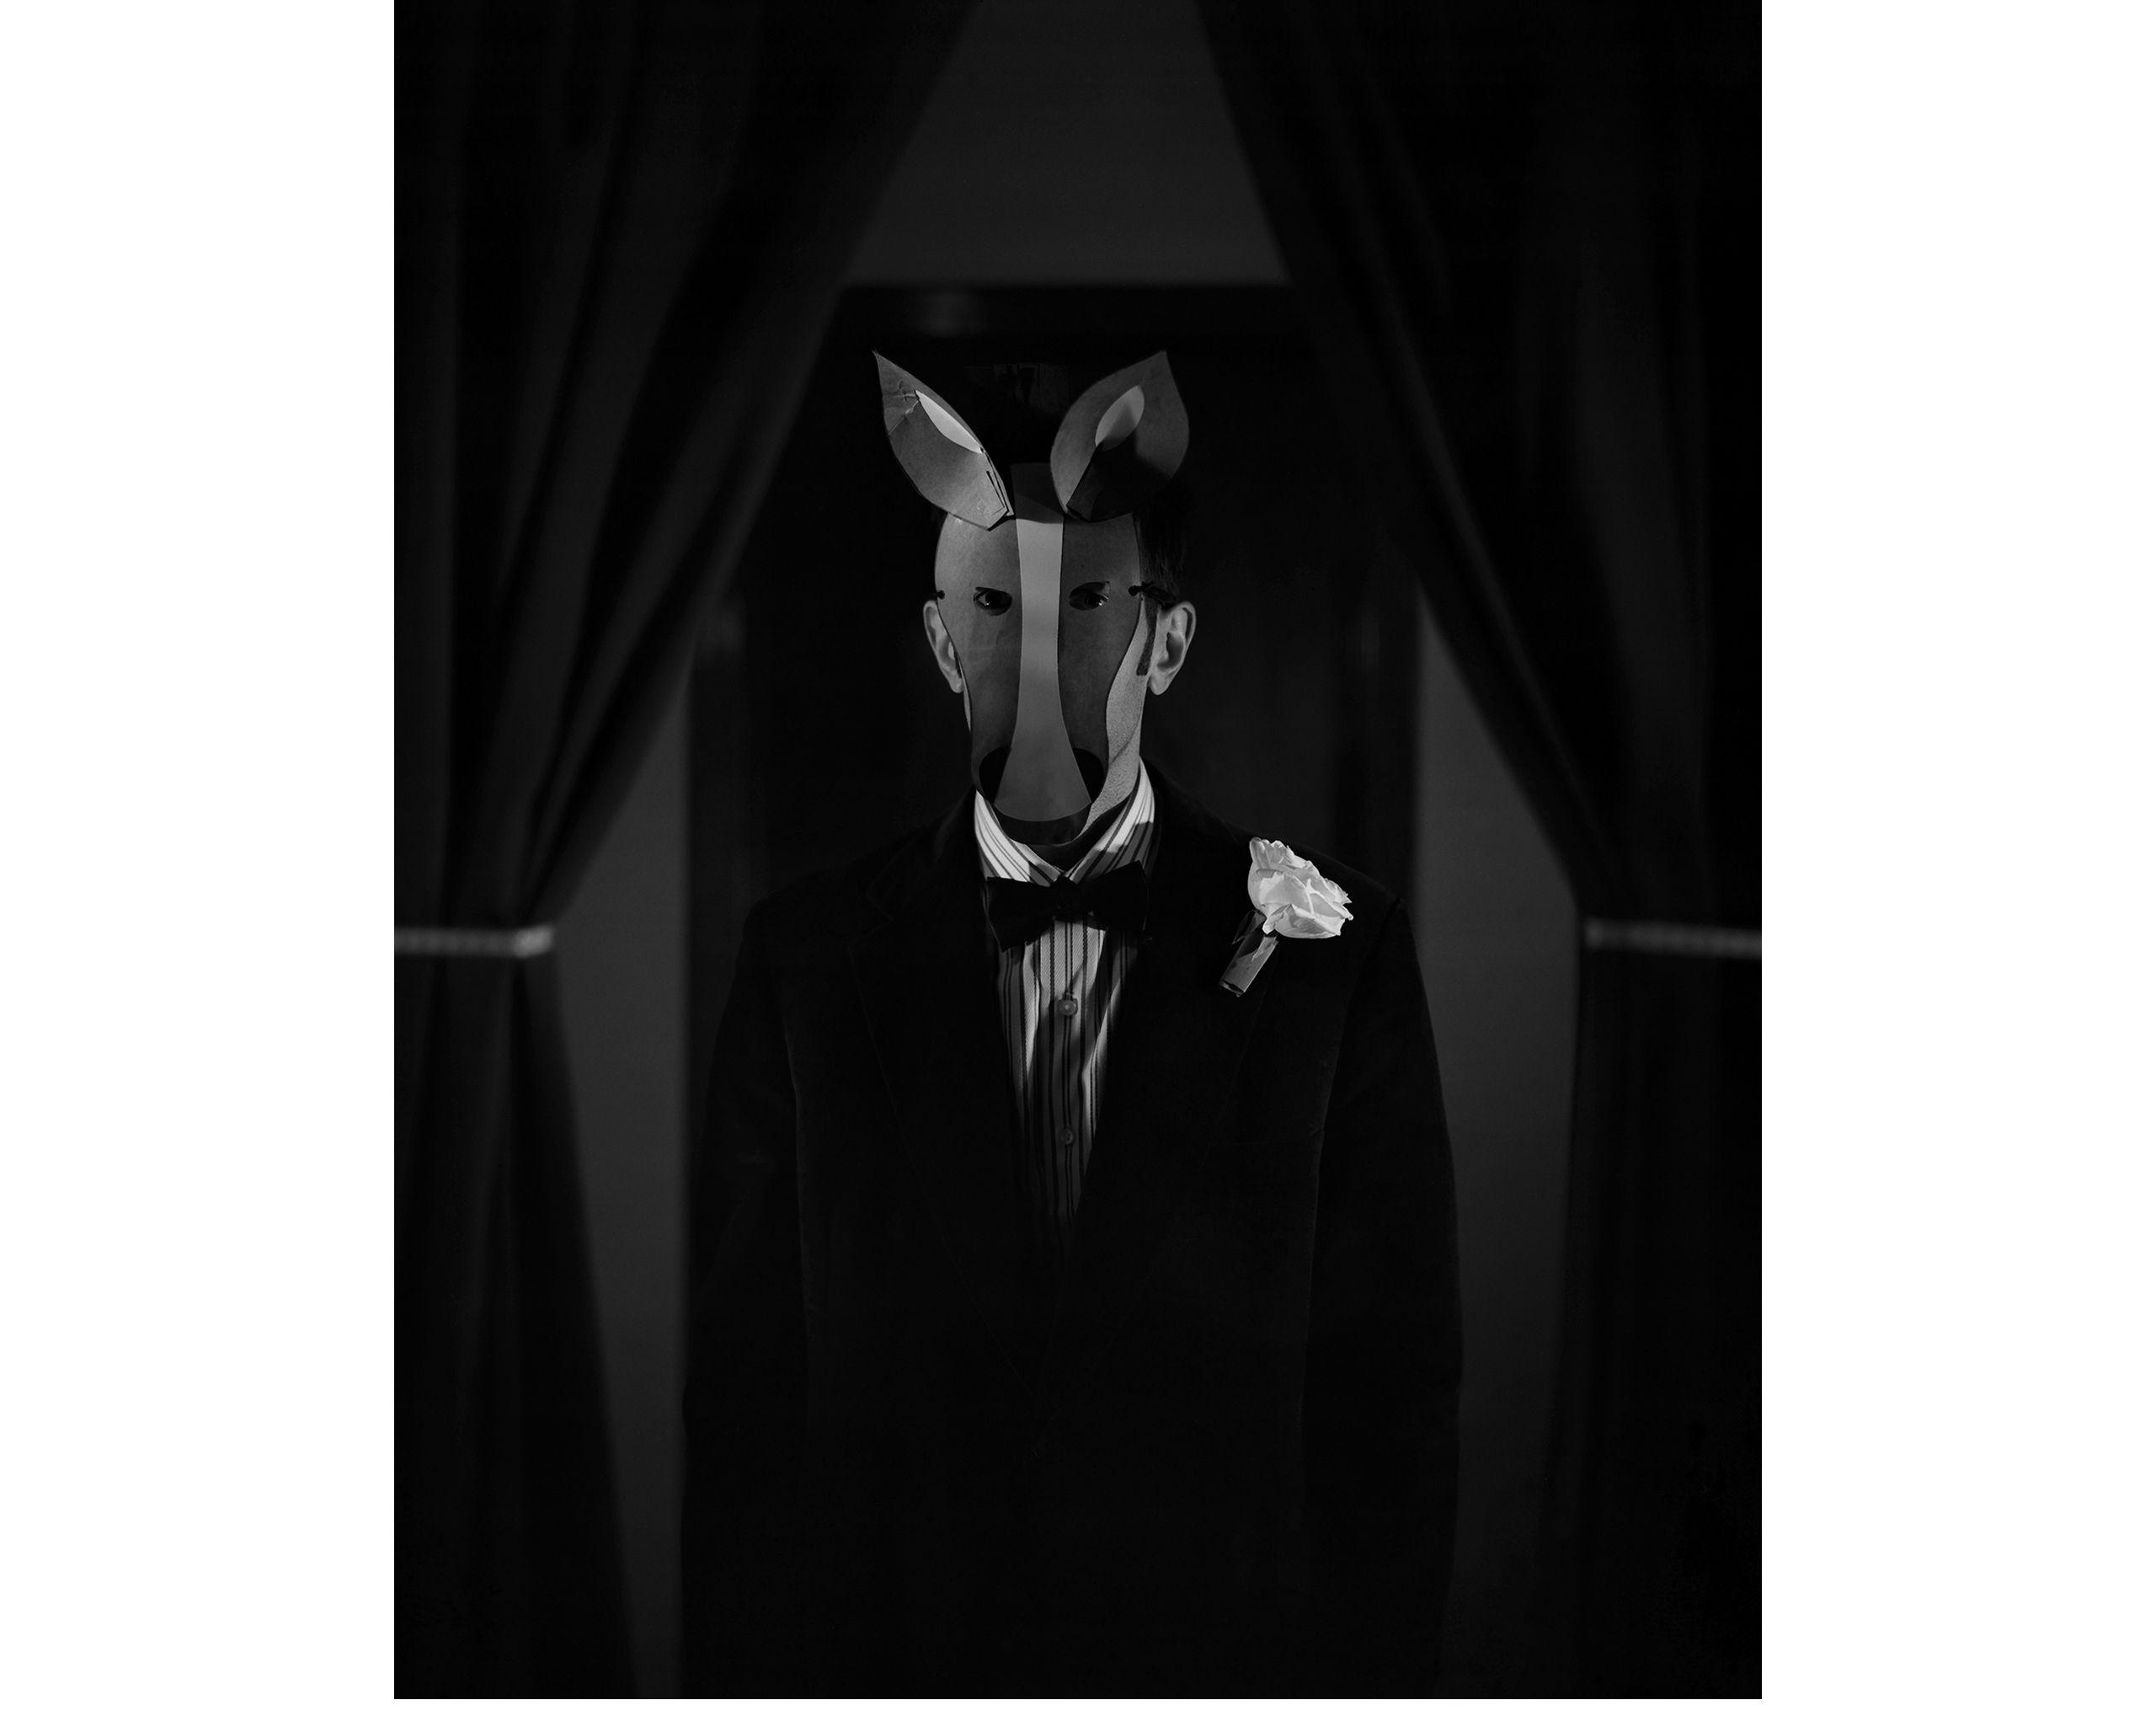 Horseman_HiRes_2017x2560CANVAS_bottom.jpg